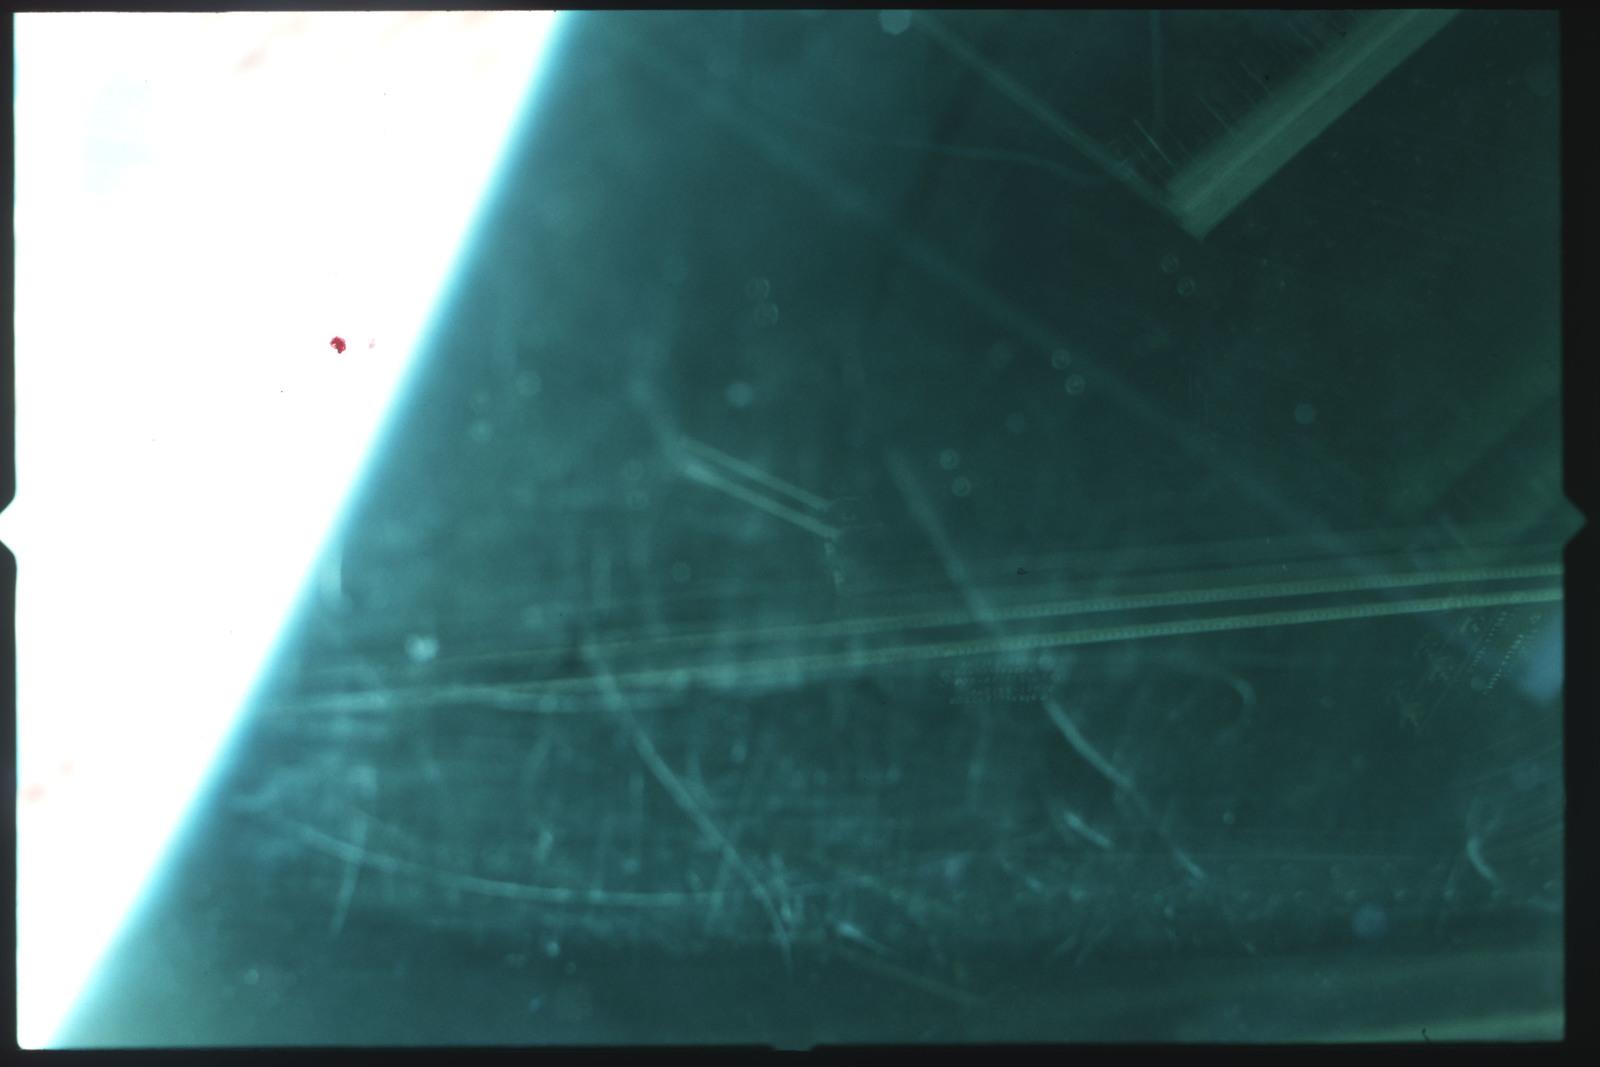 S01-07-517 - STS-001 - Crew compartment flight deck window debris,damage,streak documentation